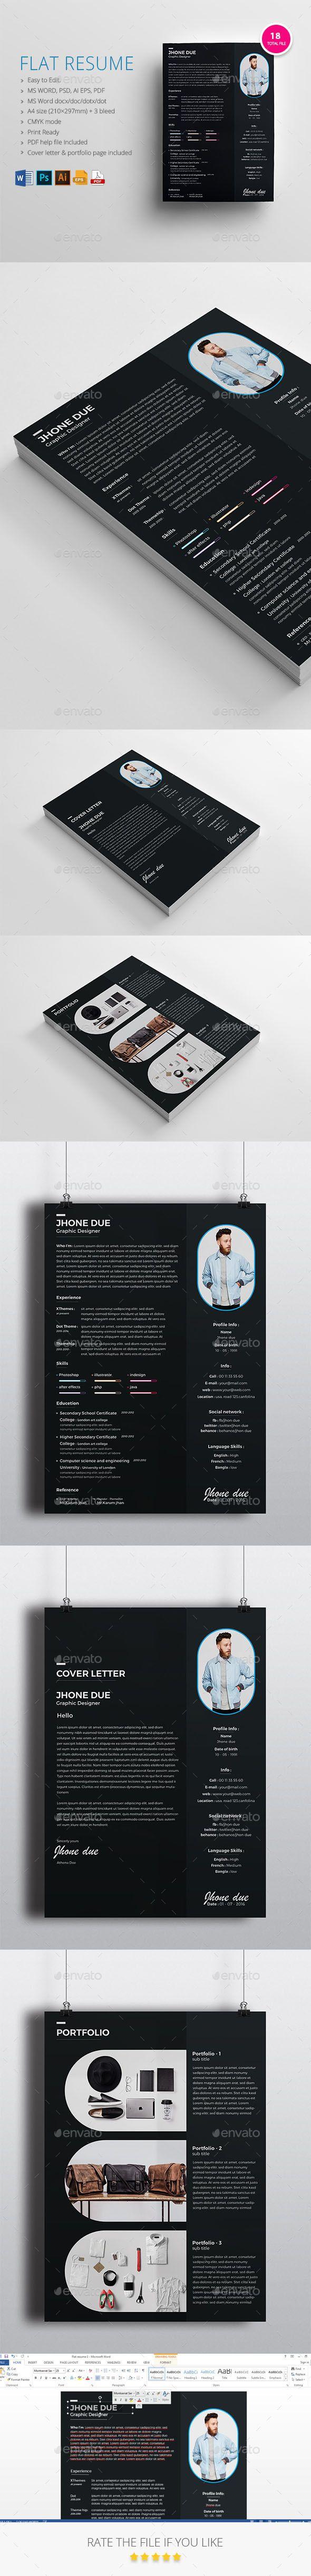 Flat Resume Best resume template, Good resume examples